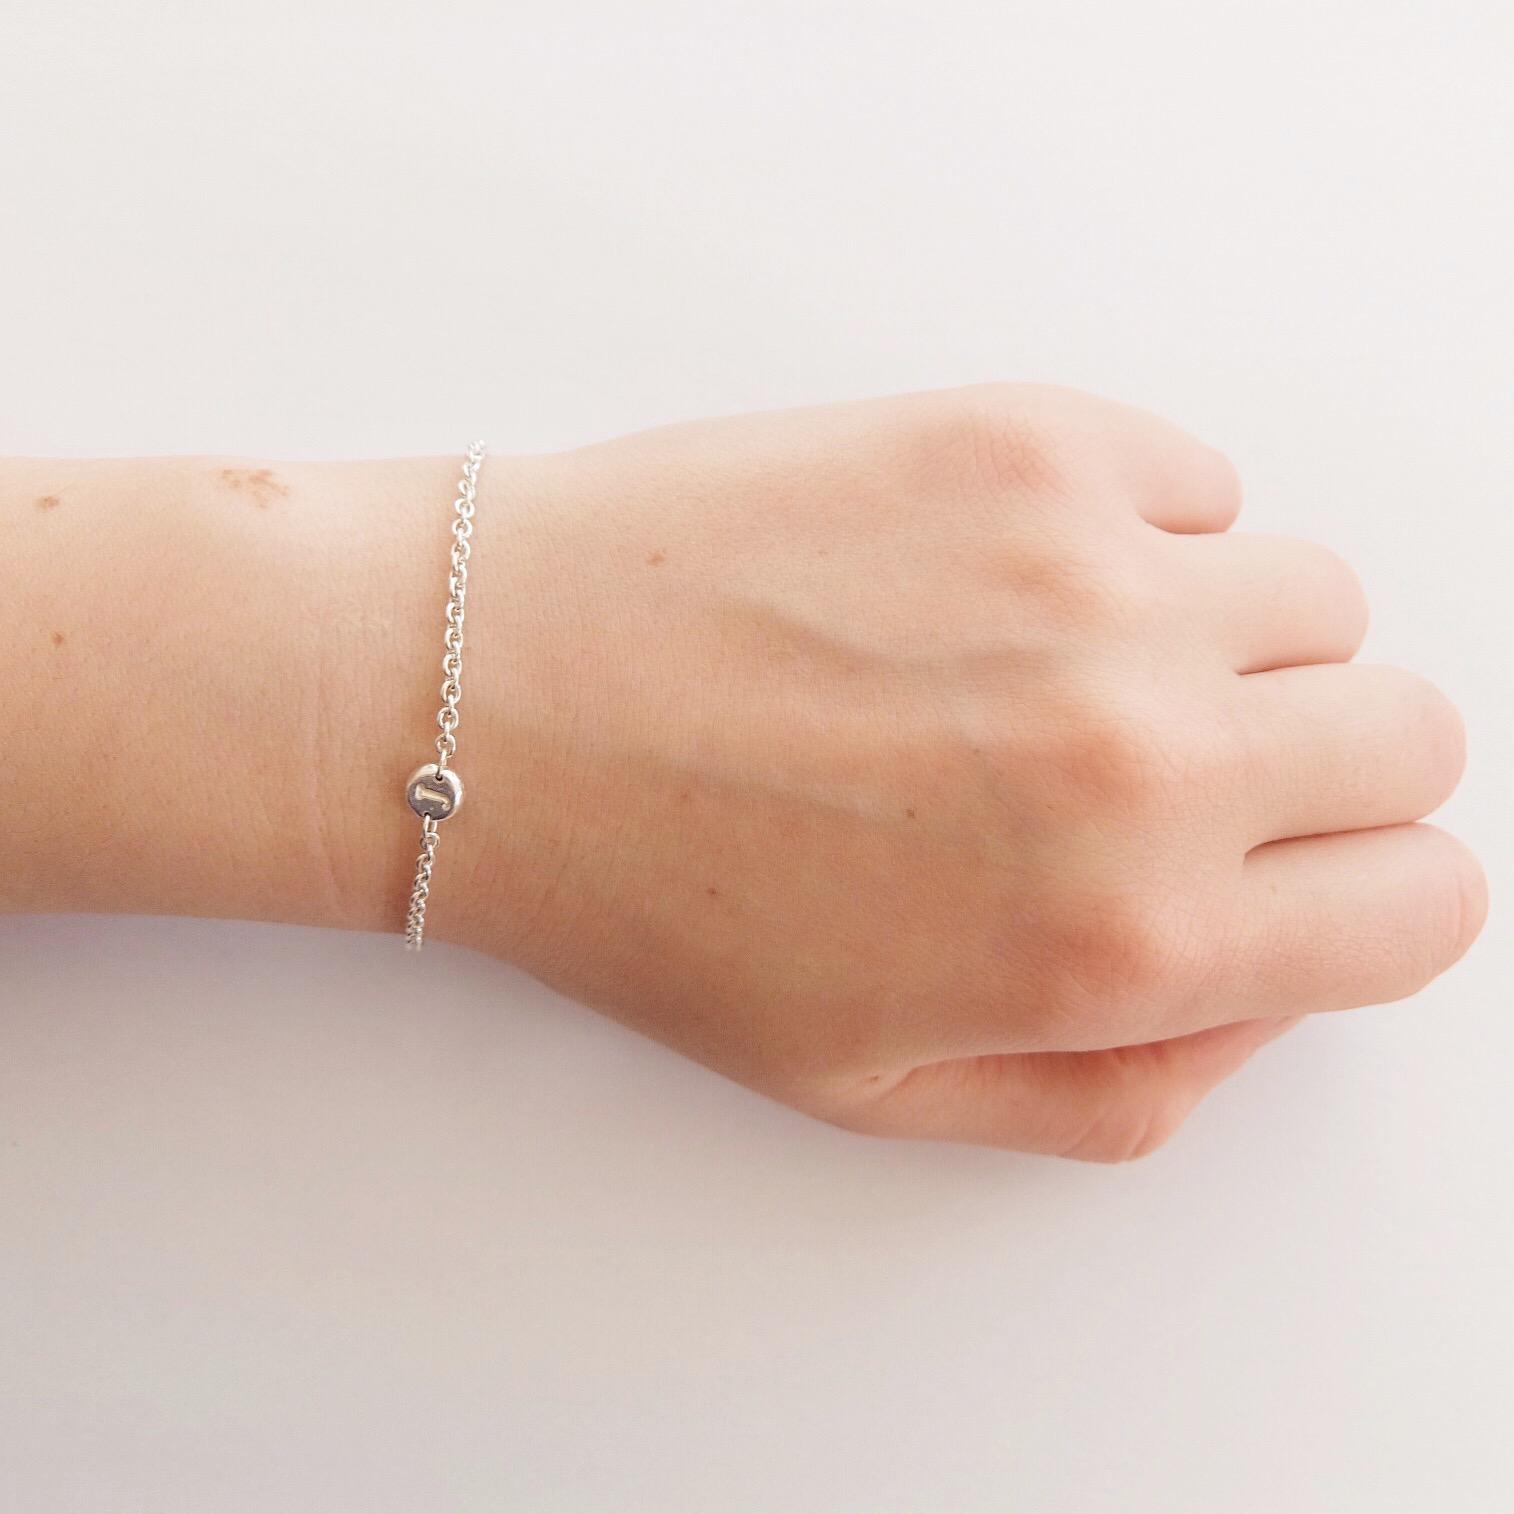 contemporary intial chain fine bracelet letter personalised fine jewellery handmade in uk devon exeter jasmine bowden.jpg